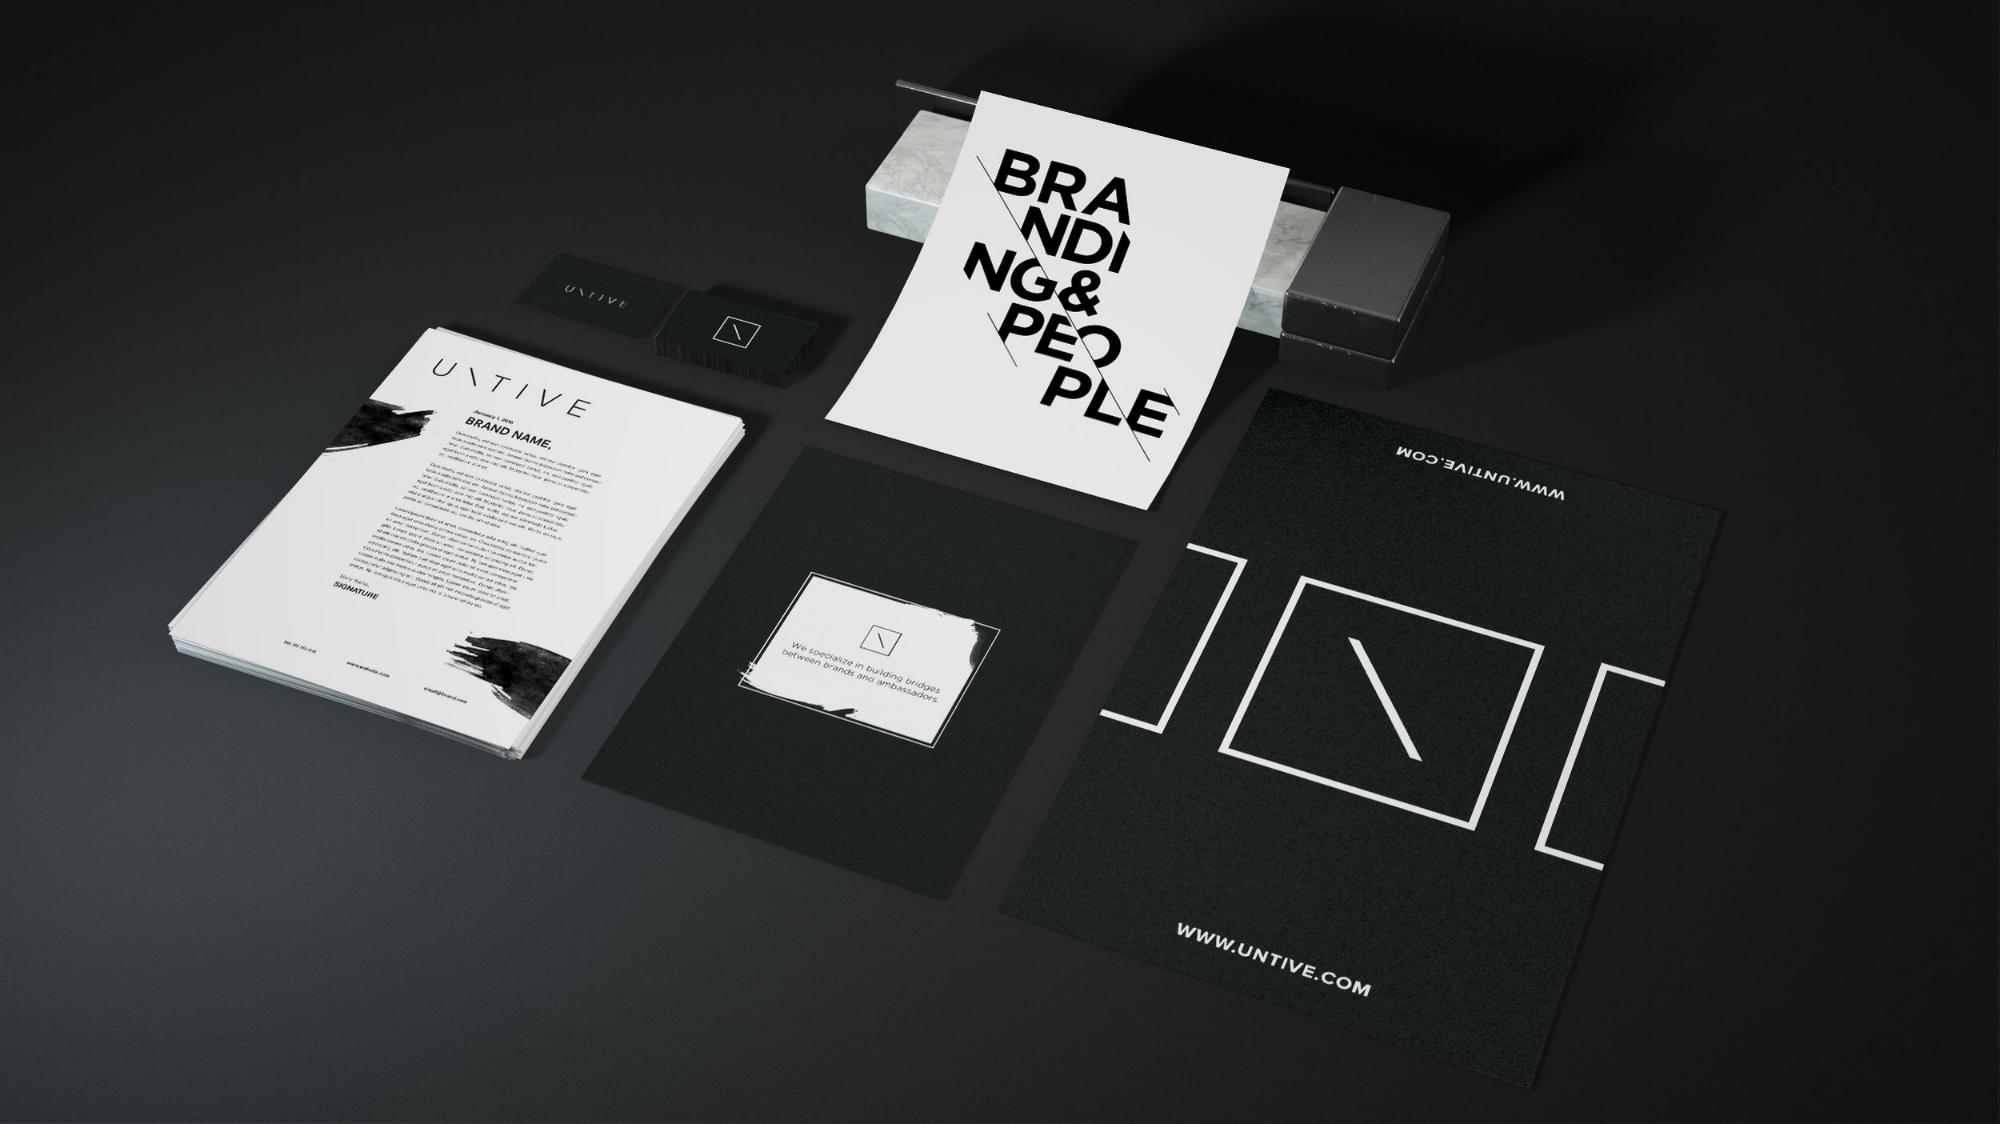 Eivind Holum – Freelance web and graphic designer based in Oslo